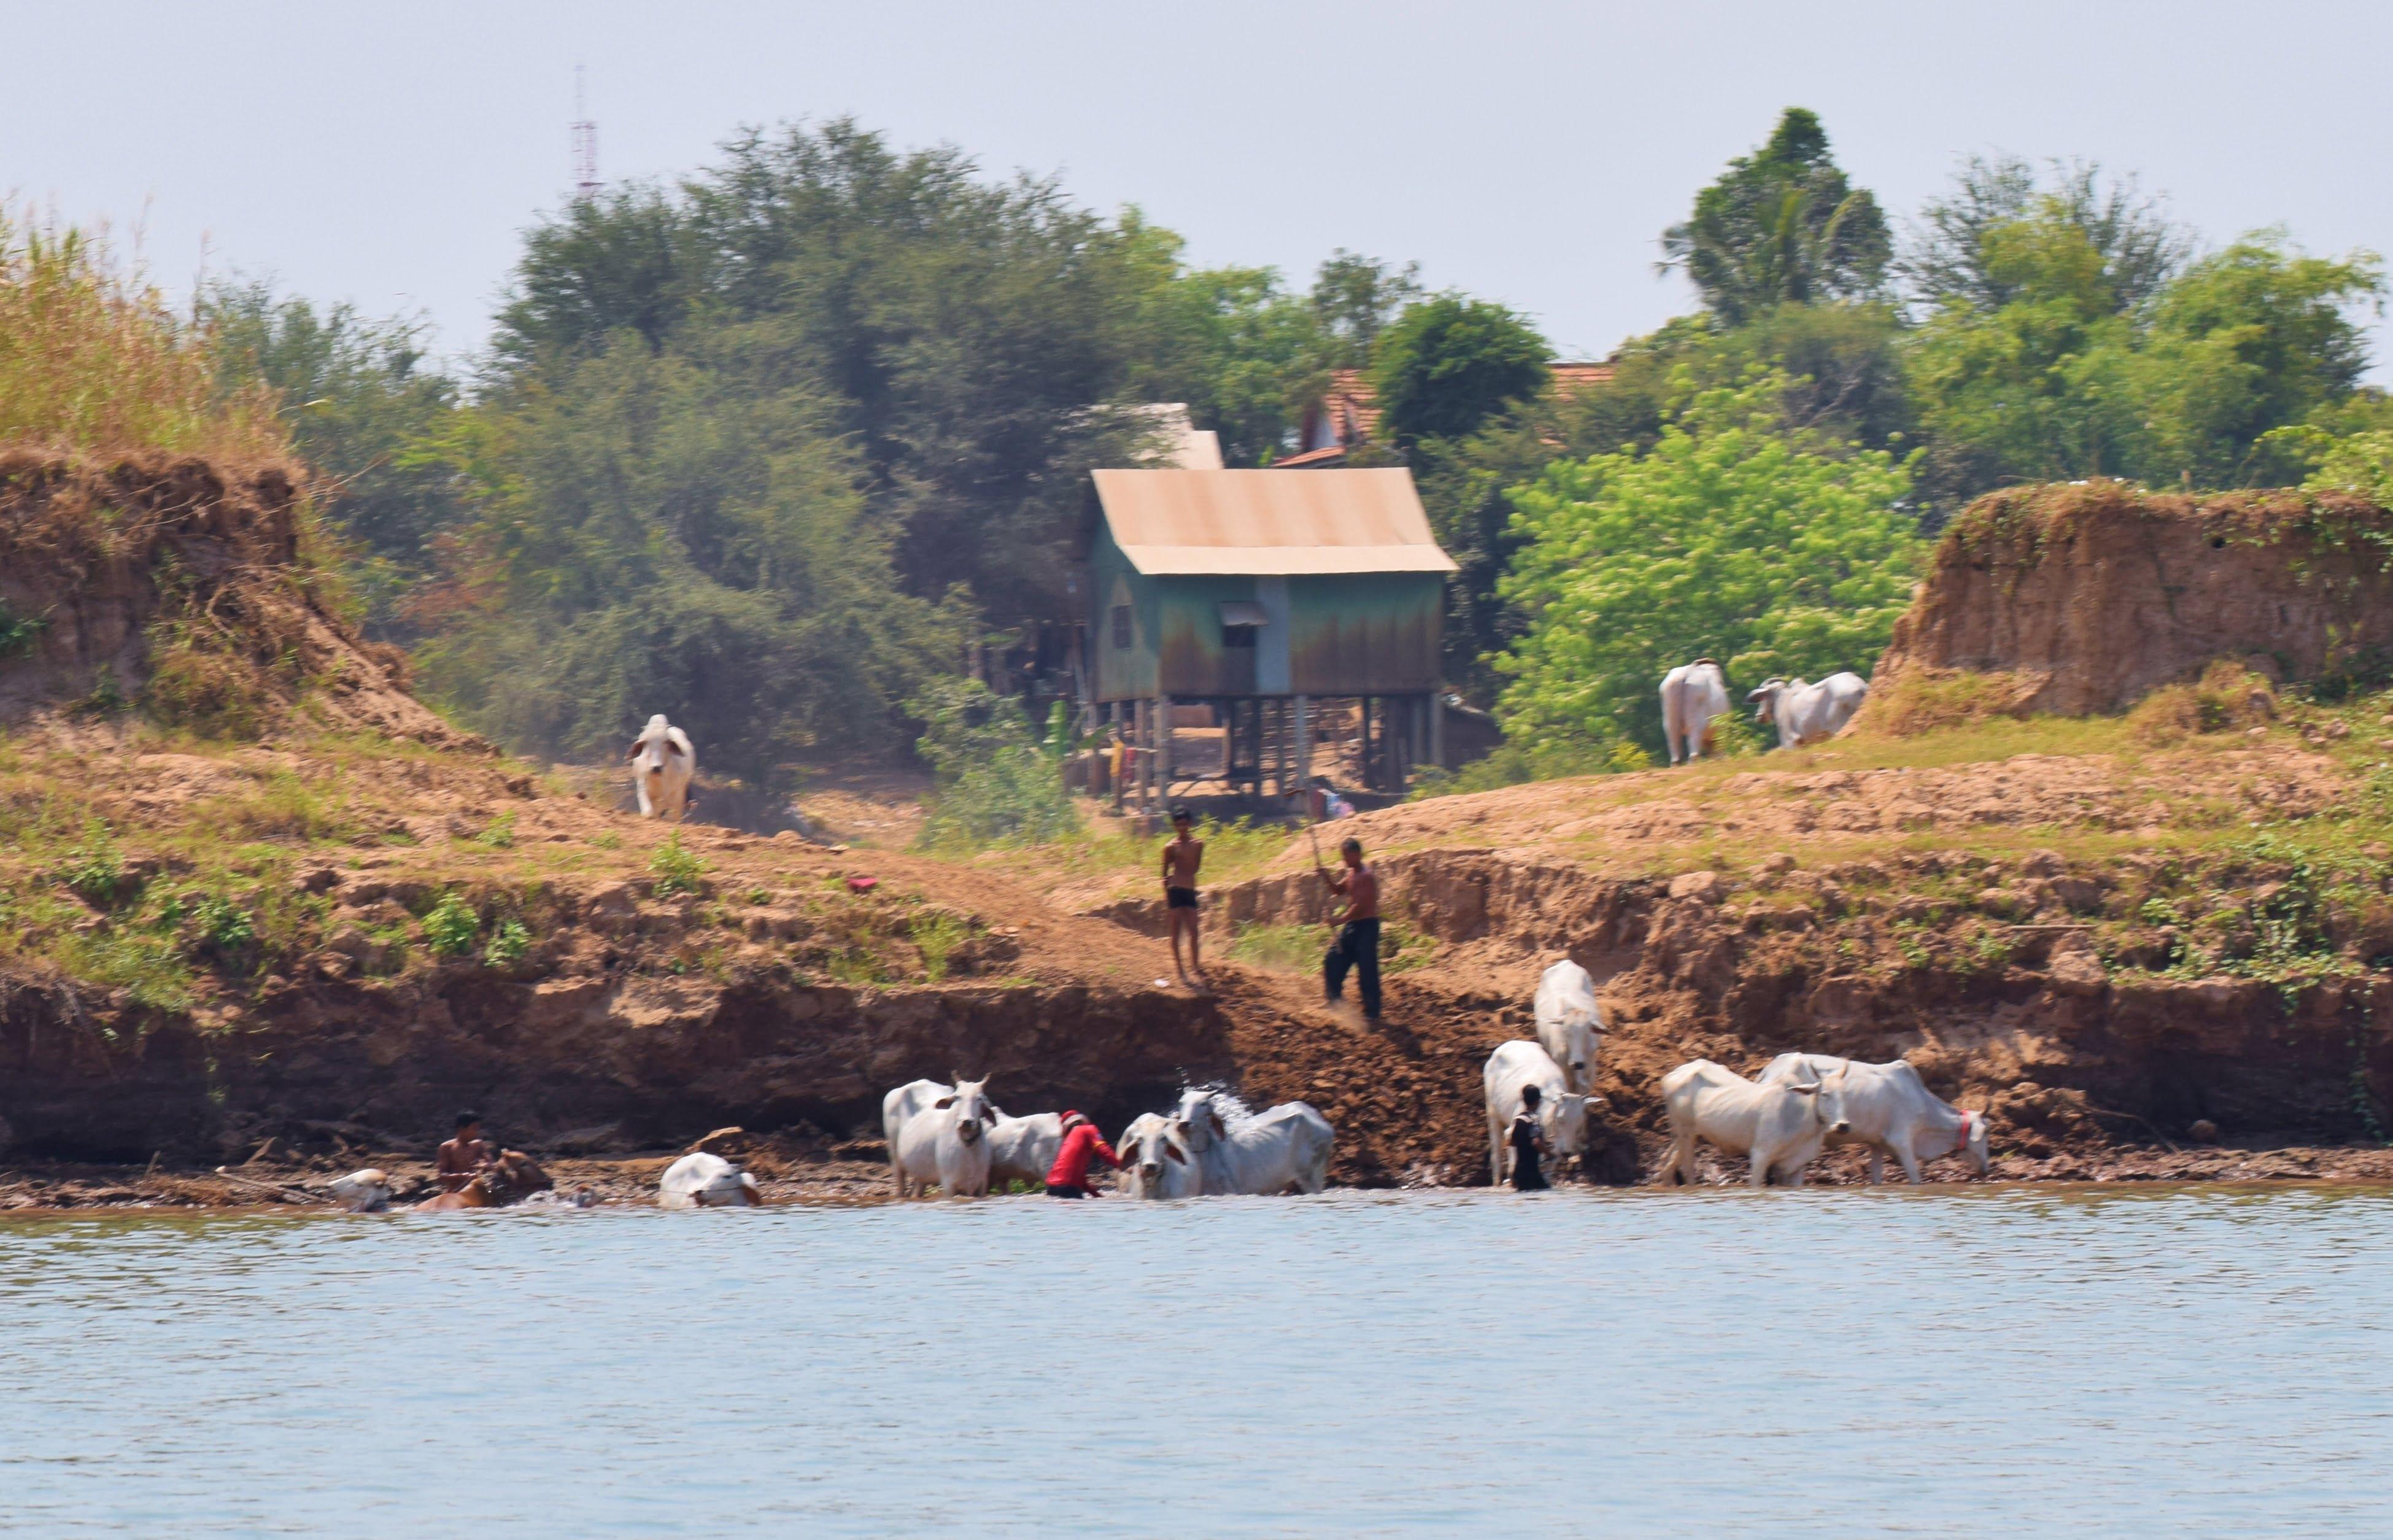 Cambodge - En bateau rapide